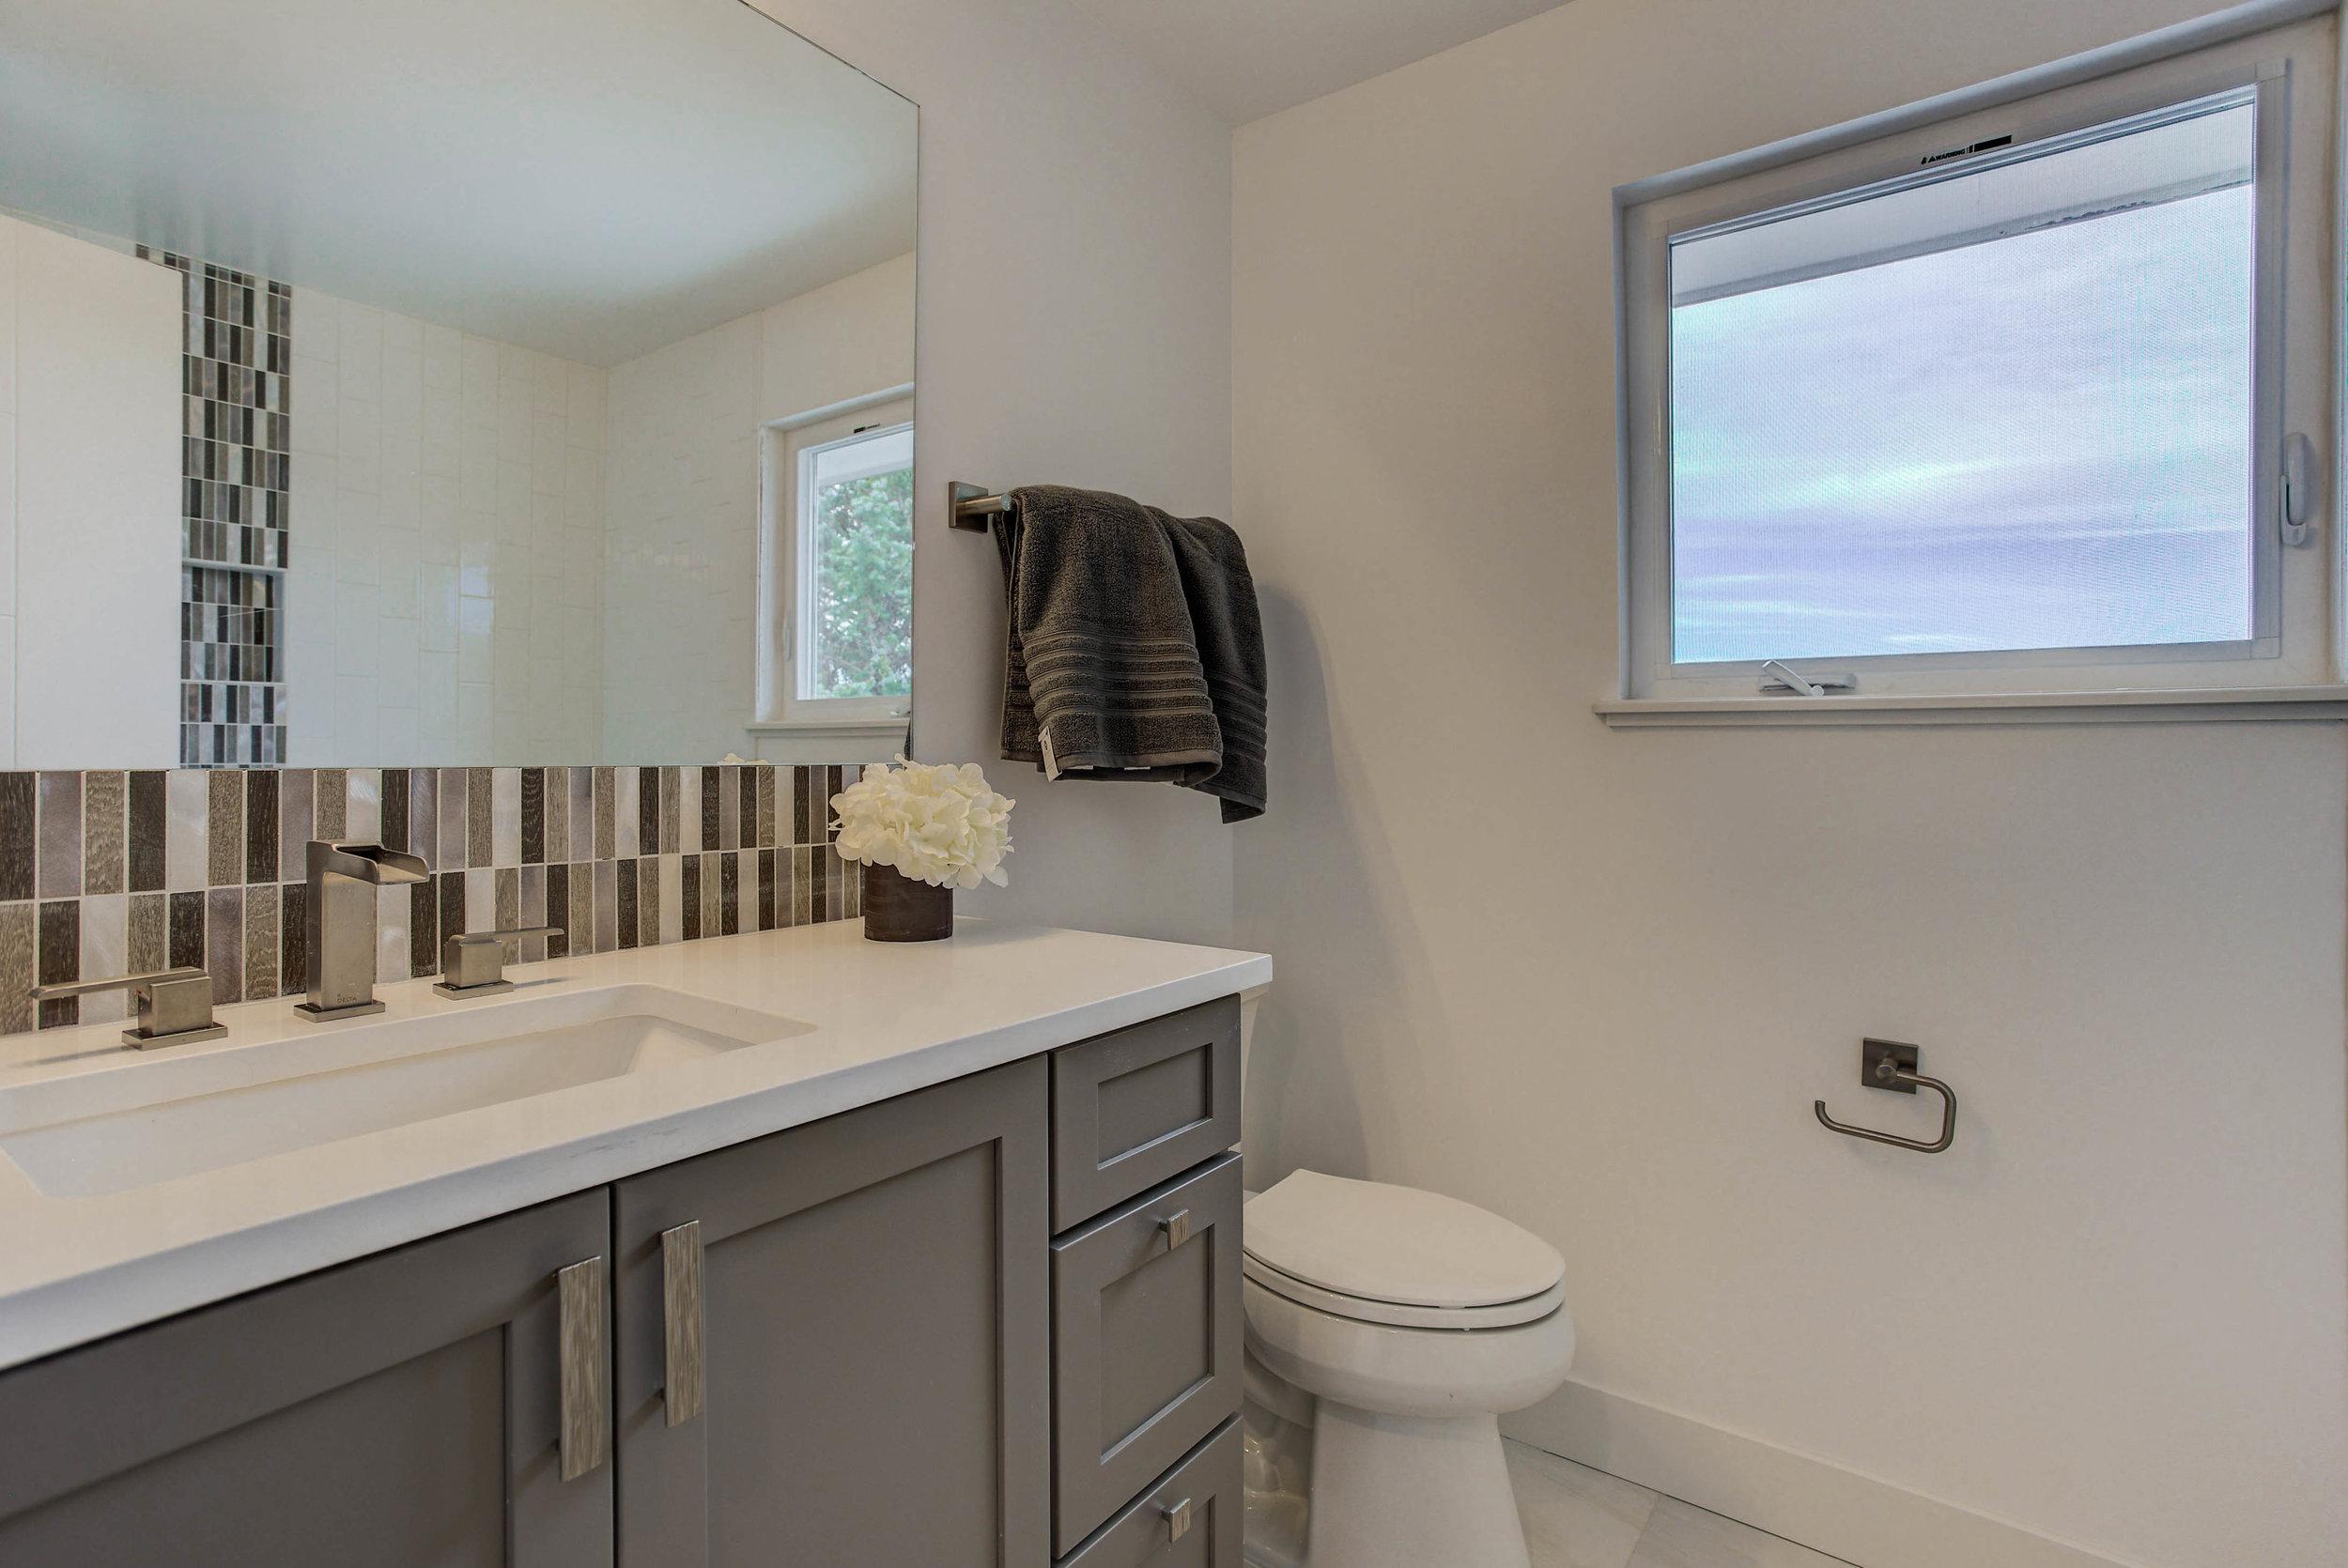 2250 Vassar Dr_Bathroom02.jpg